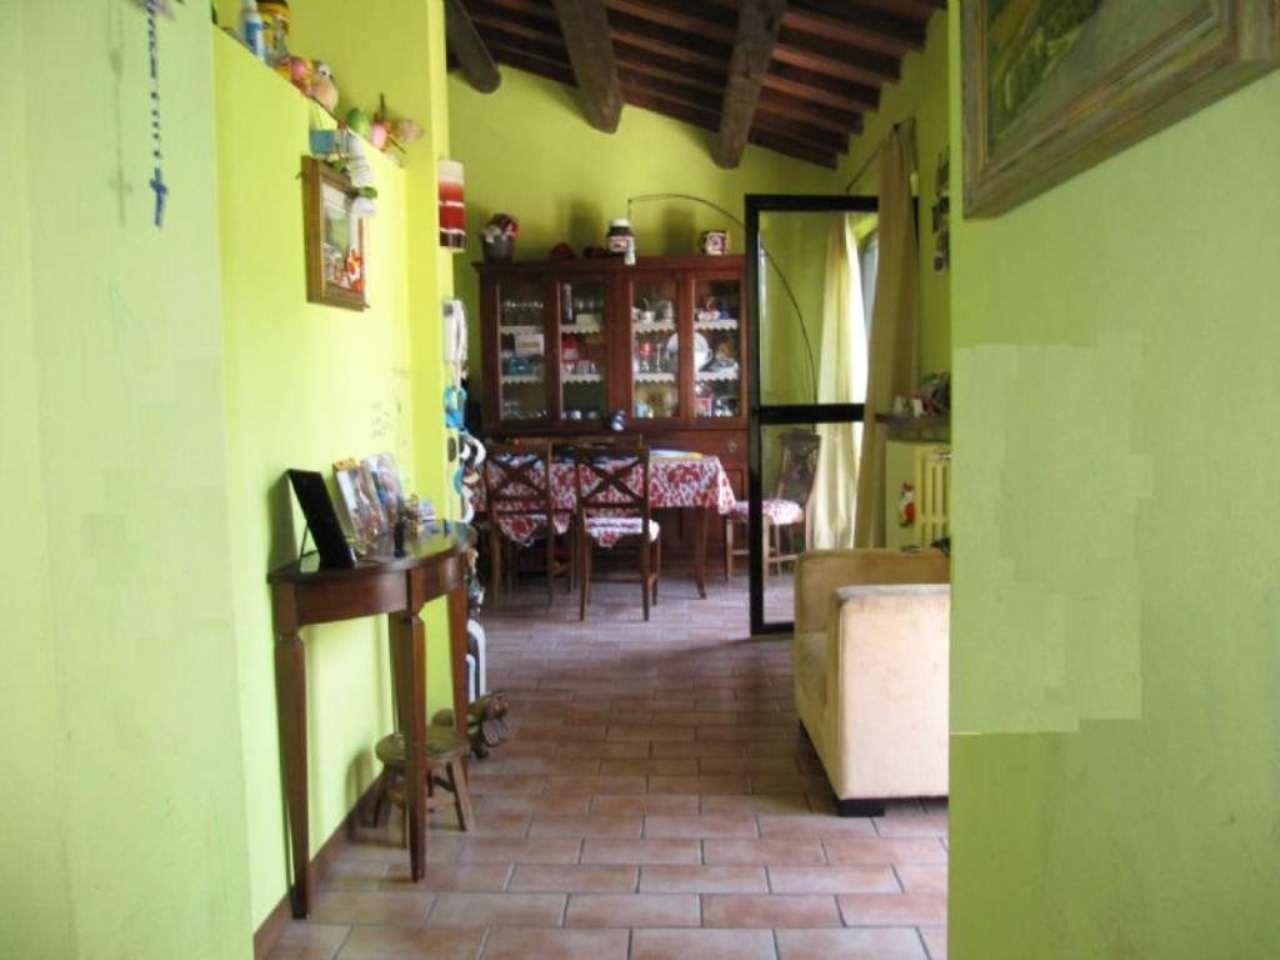 Bilocale Parma Via Case Vecchie 3